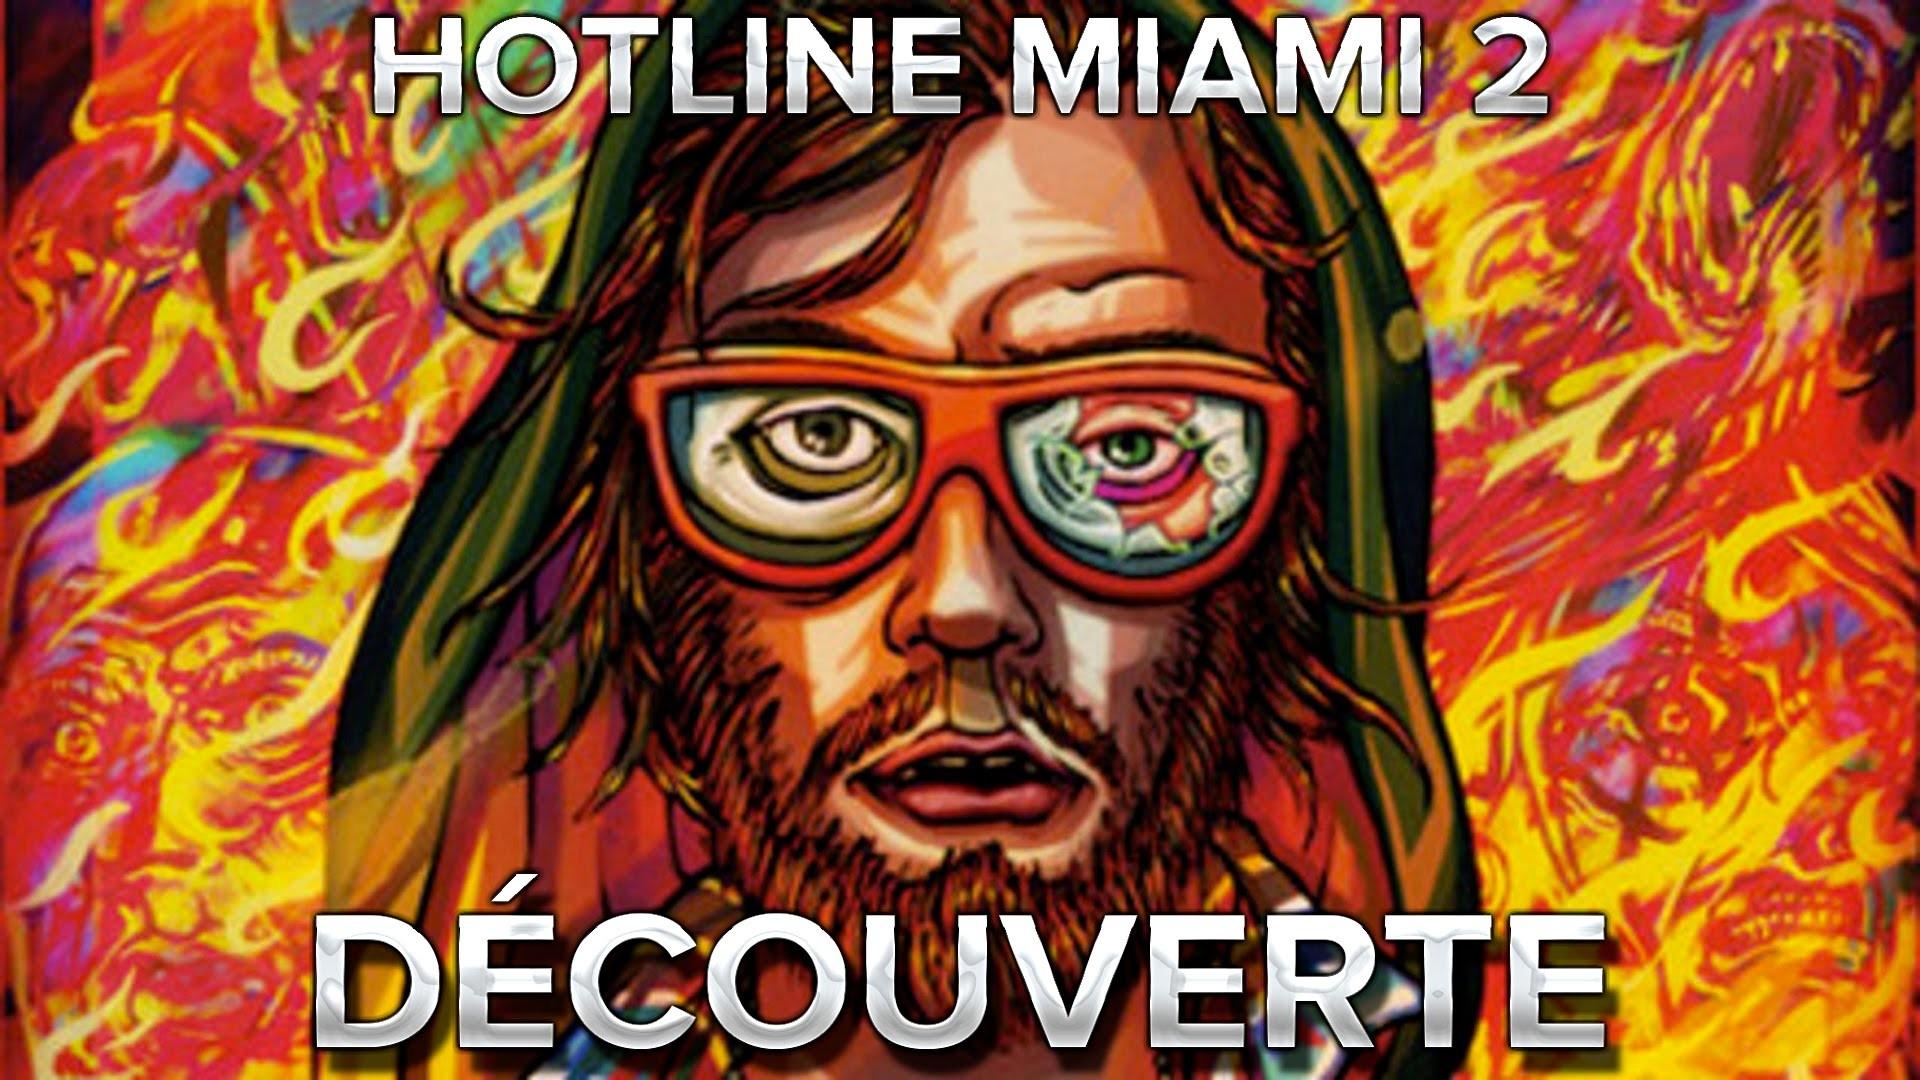 Hotline Miami 2 #1 : Découverte